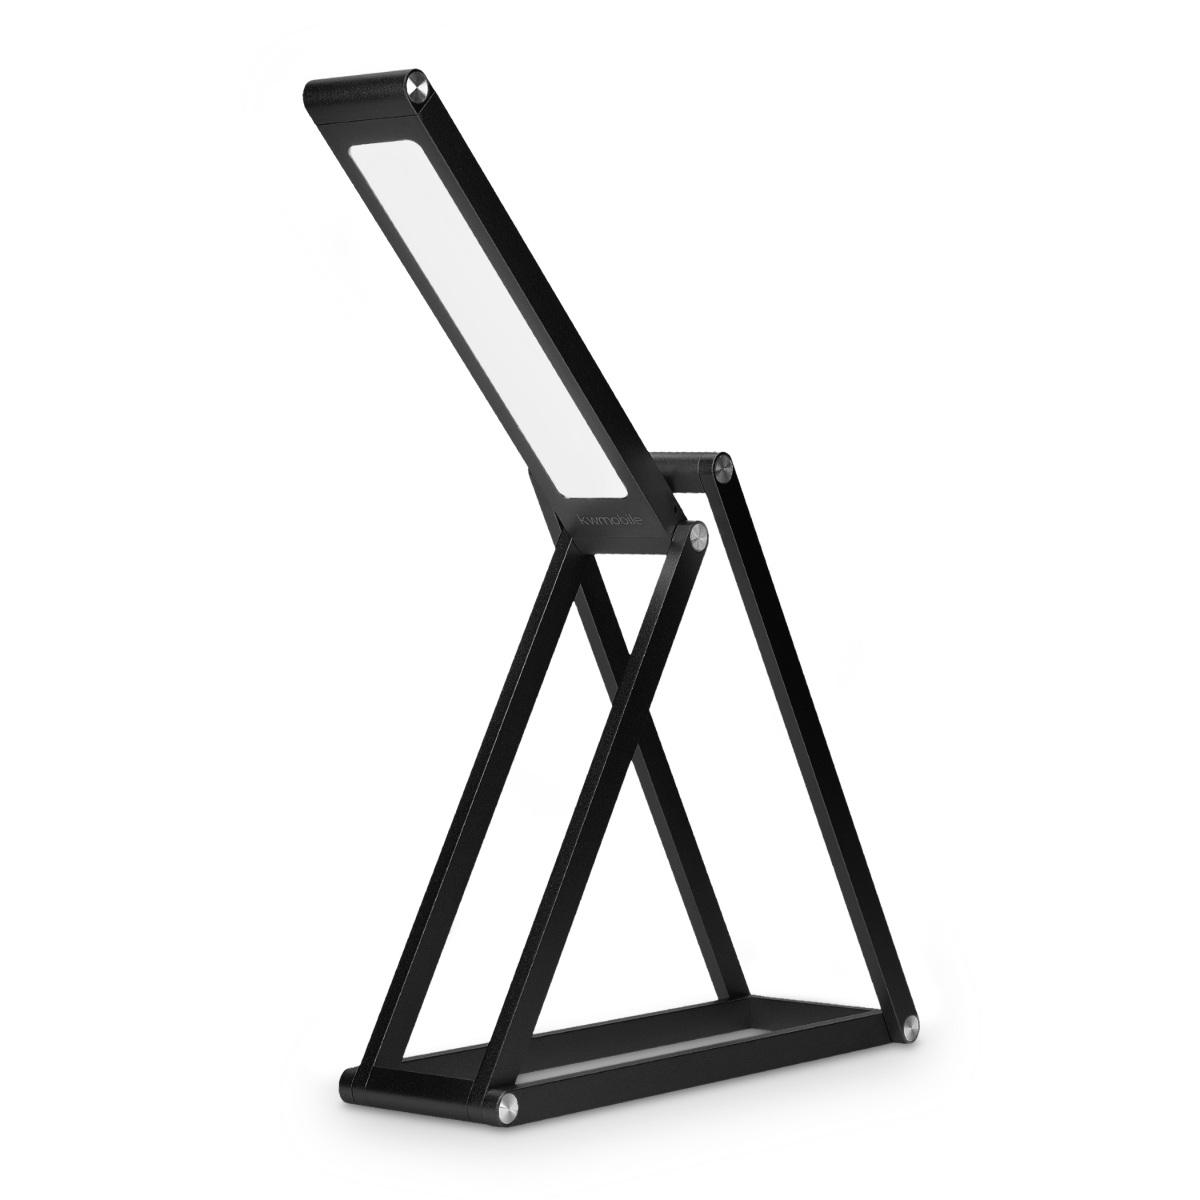 led aluminium tischlampe faltbar akku lampe dimmbar. Black Bedroom Furniture Sets. Home Design Ideas